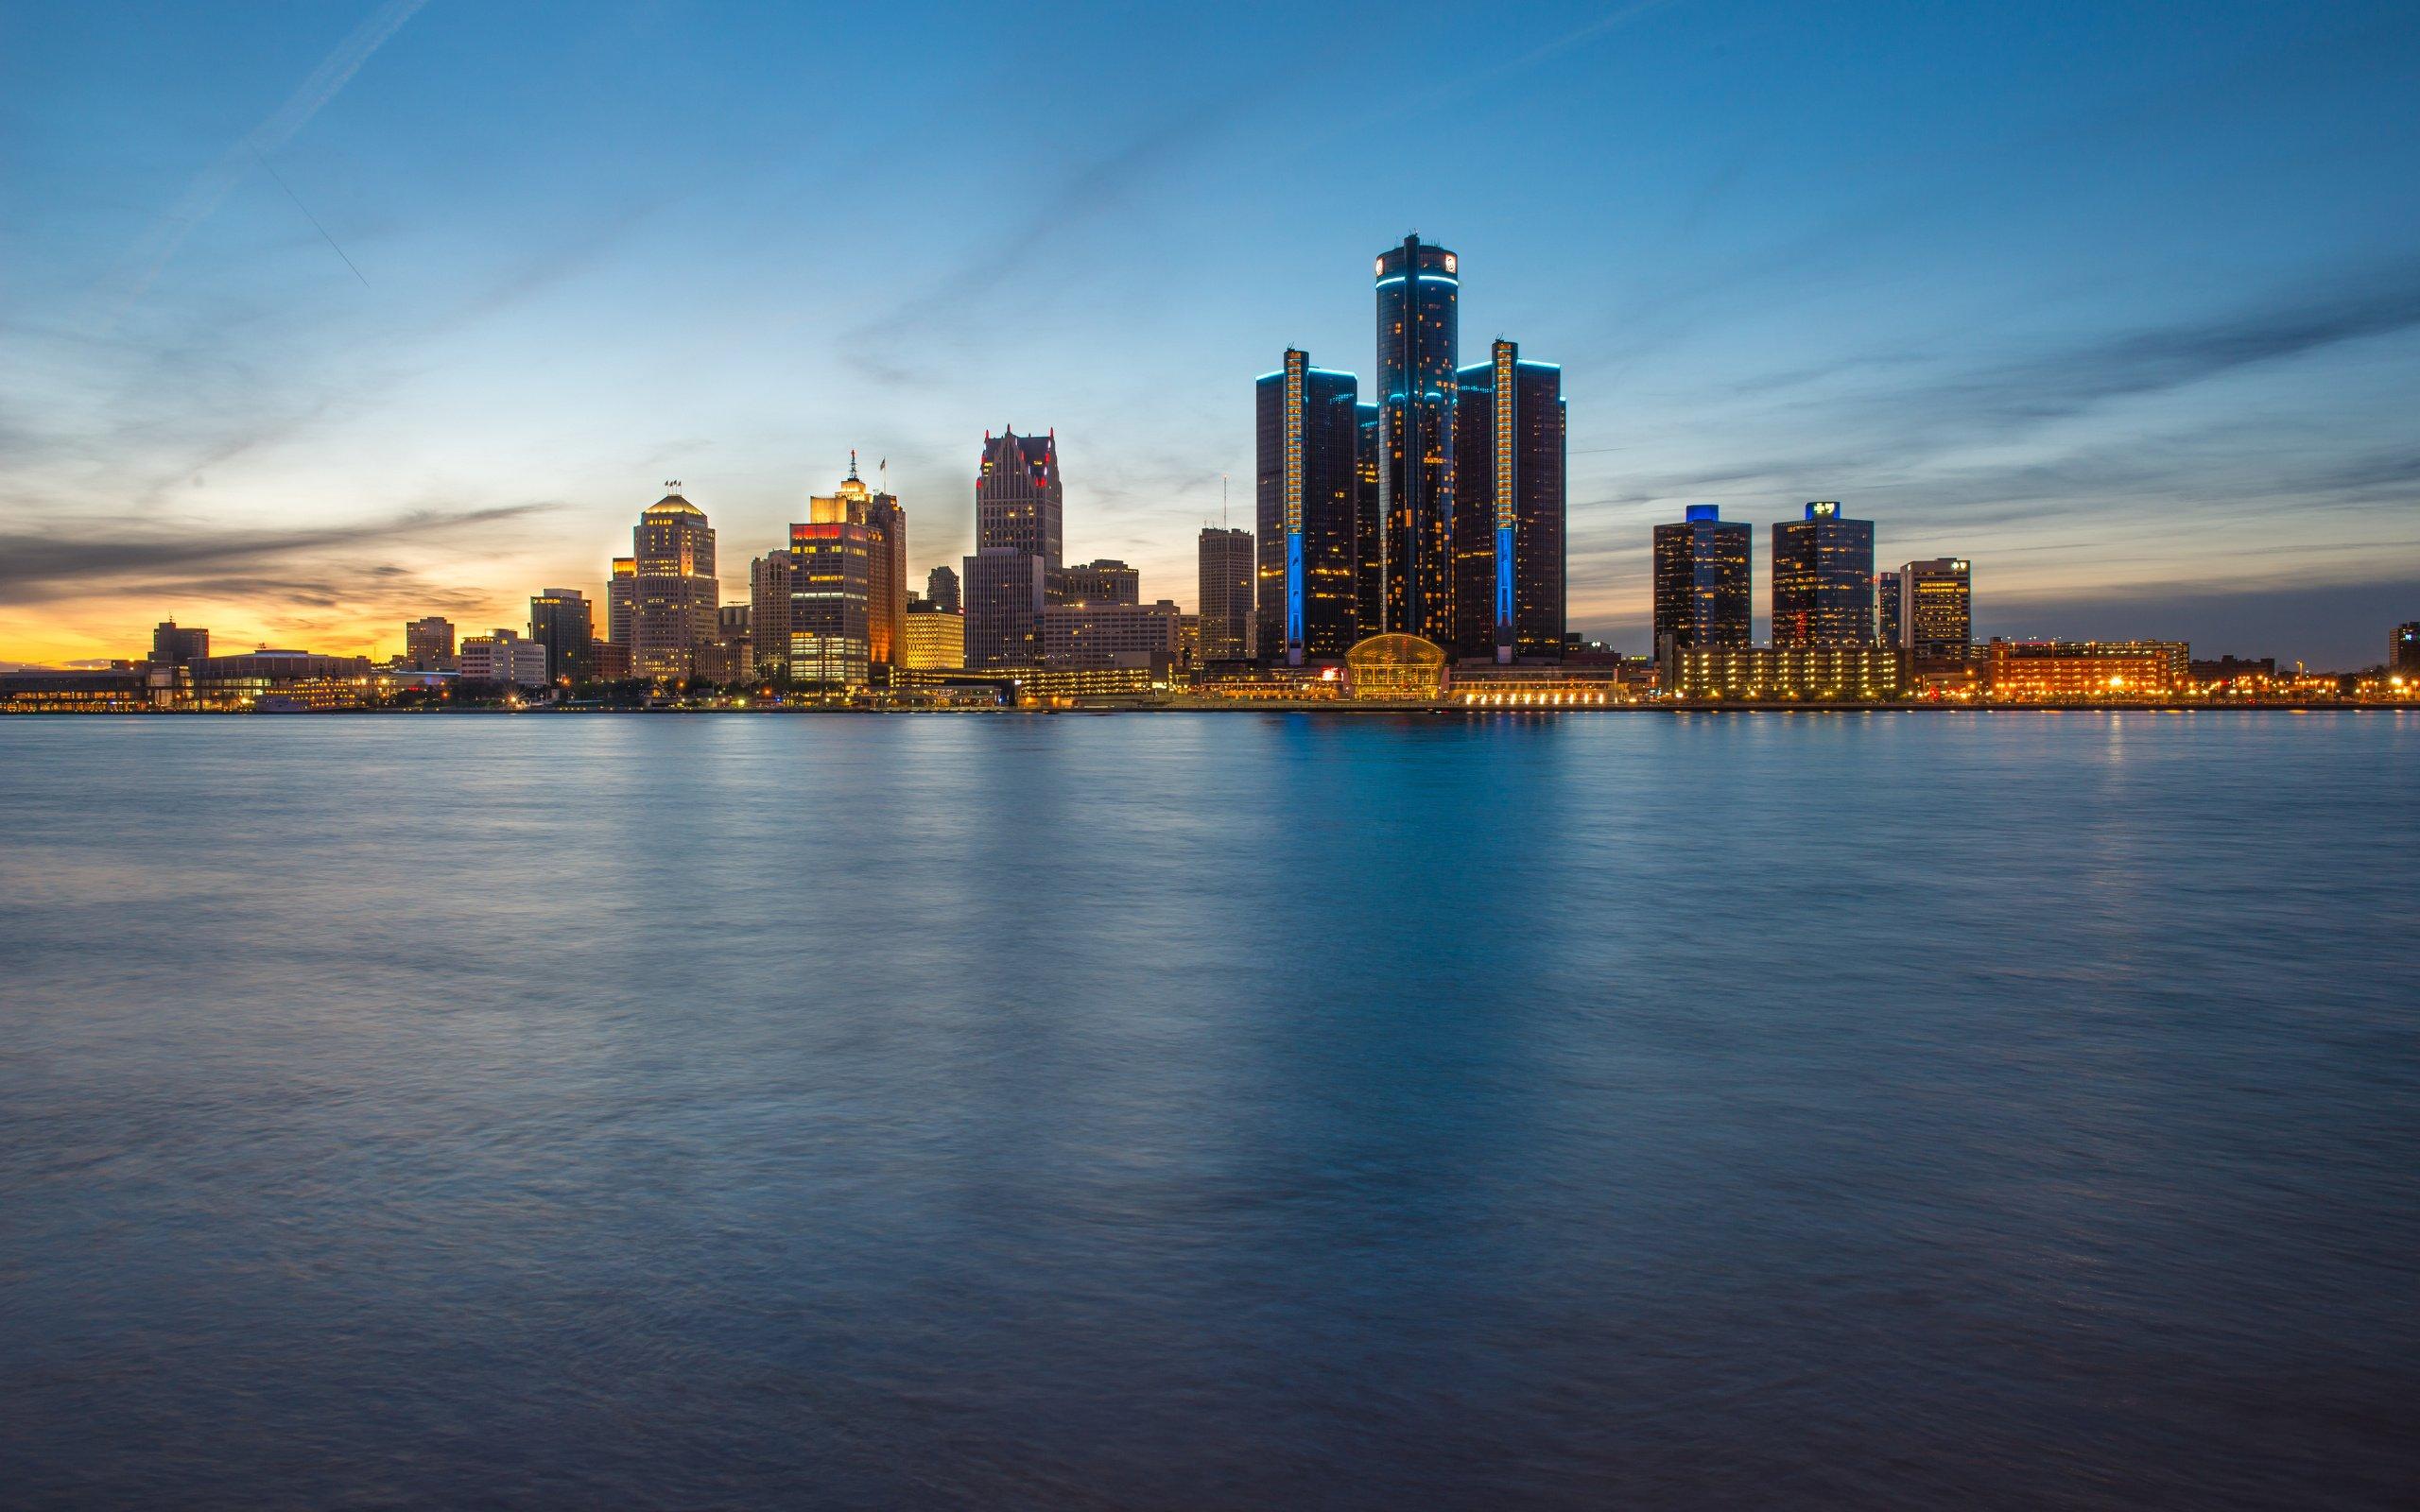 Detroit wallpaper 2560x1600 50982 2560x1600